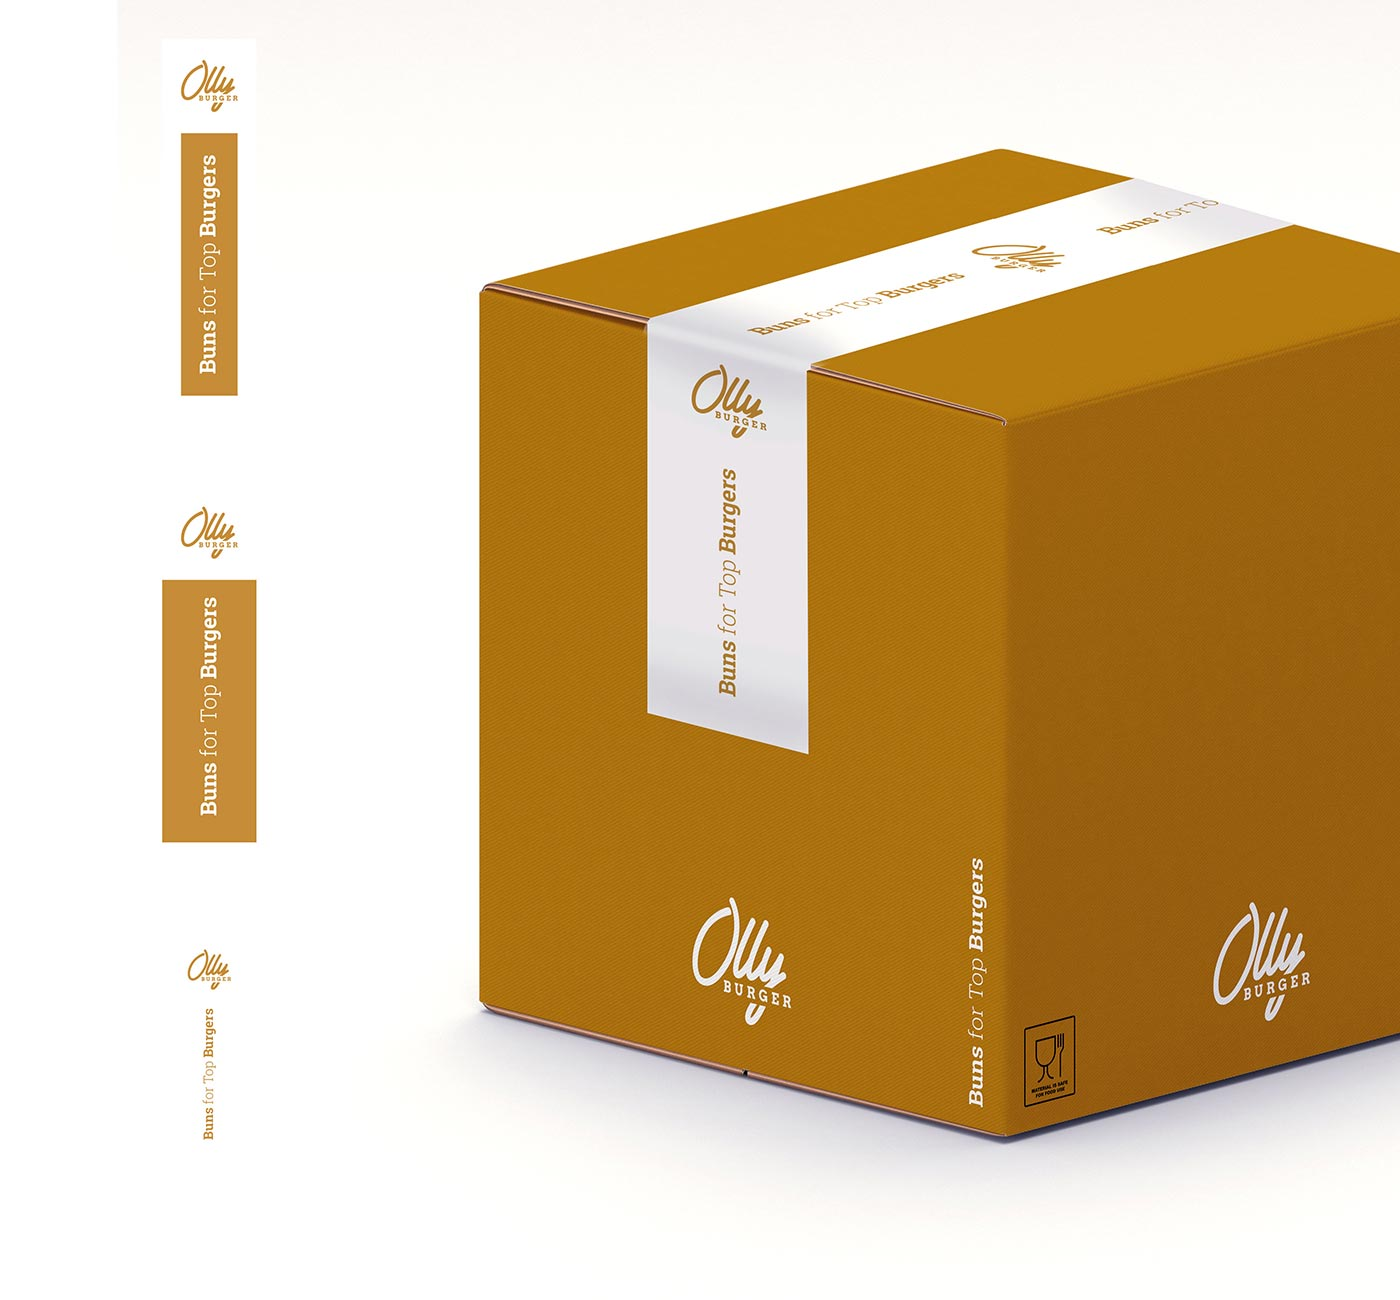 07 OLLY BURGER logotype grafico milano